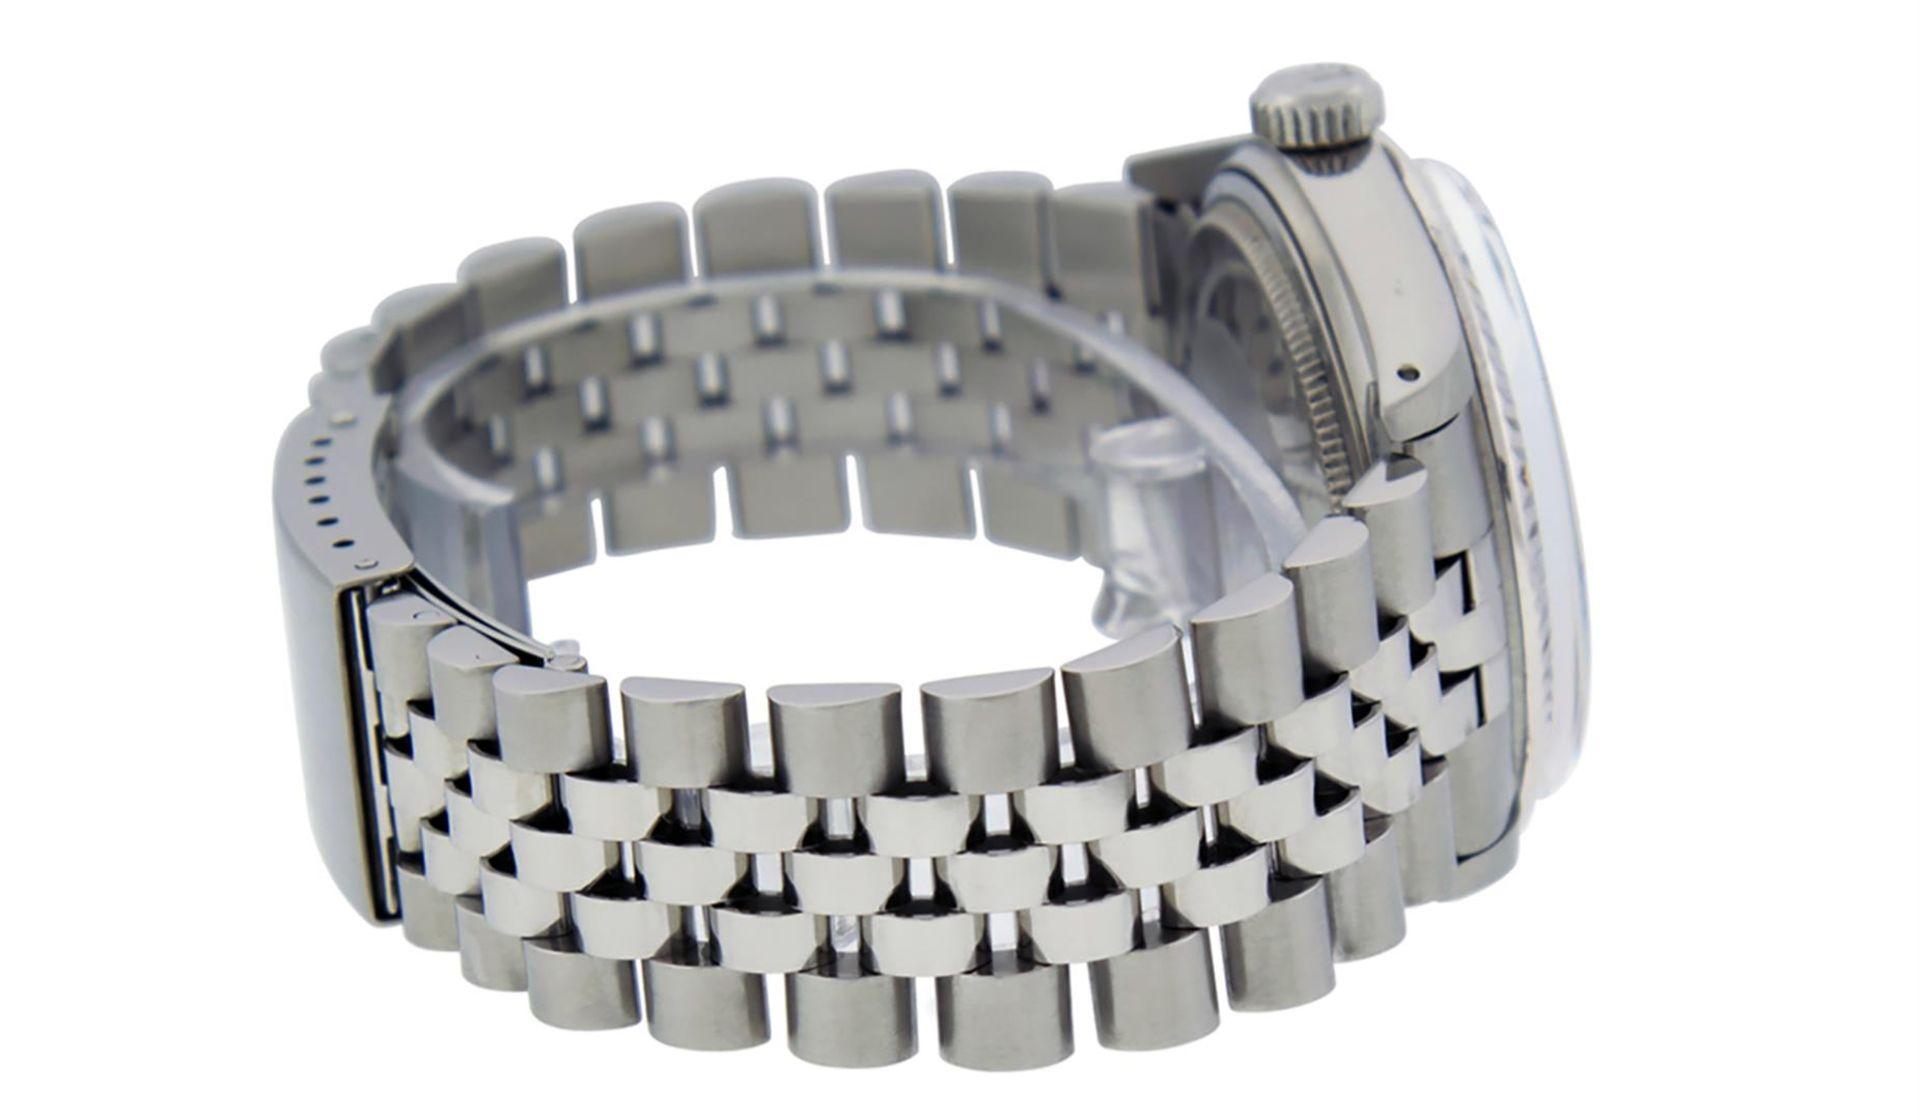 Rolex Mens Stainless Black Diamond 36MM Datejust Wristwatch - Image 4 of 9